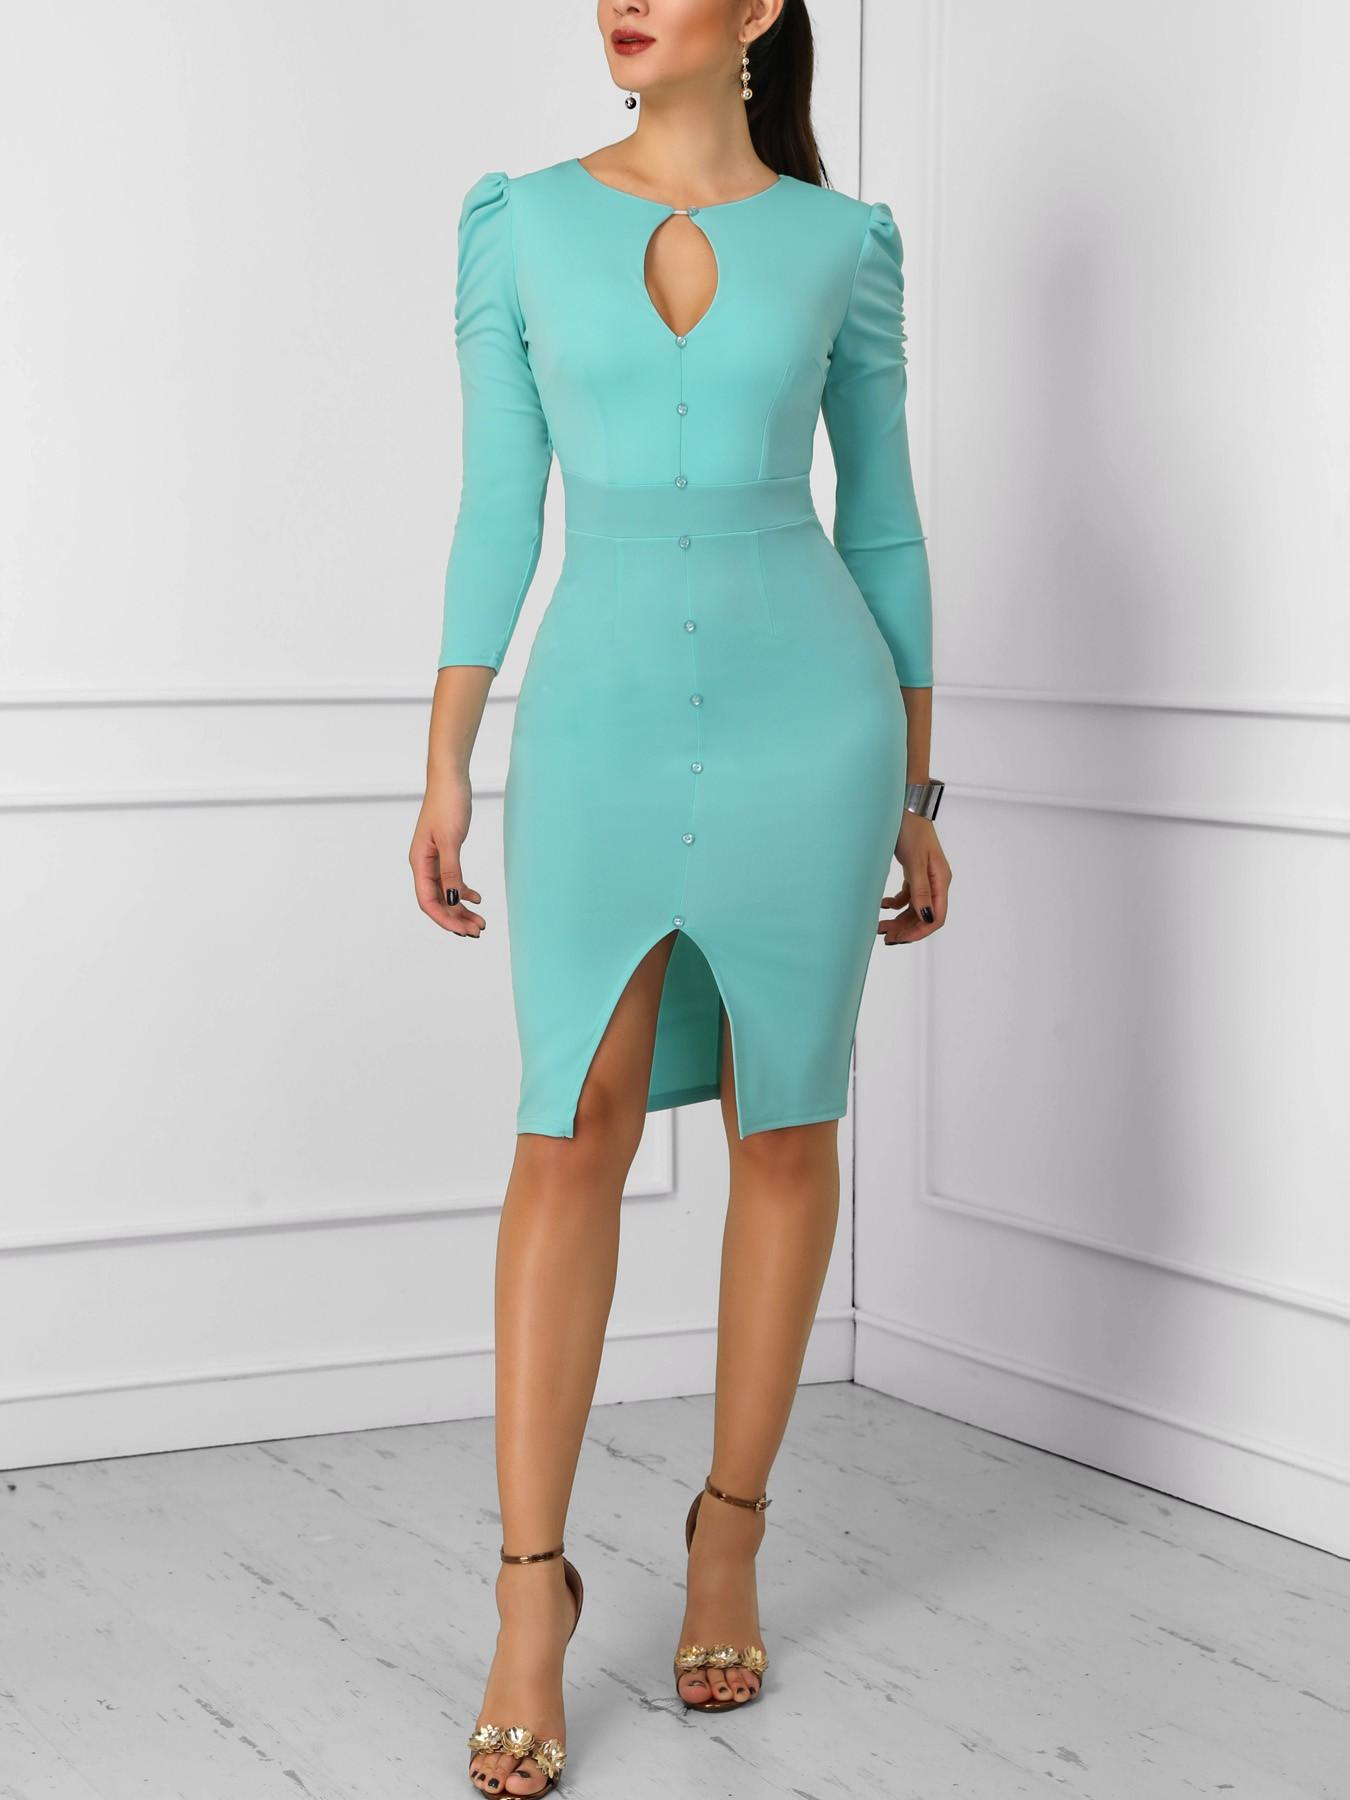 boutiquefeel / Solid Keyhole Button Design Slit Dress